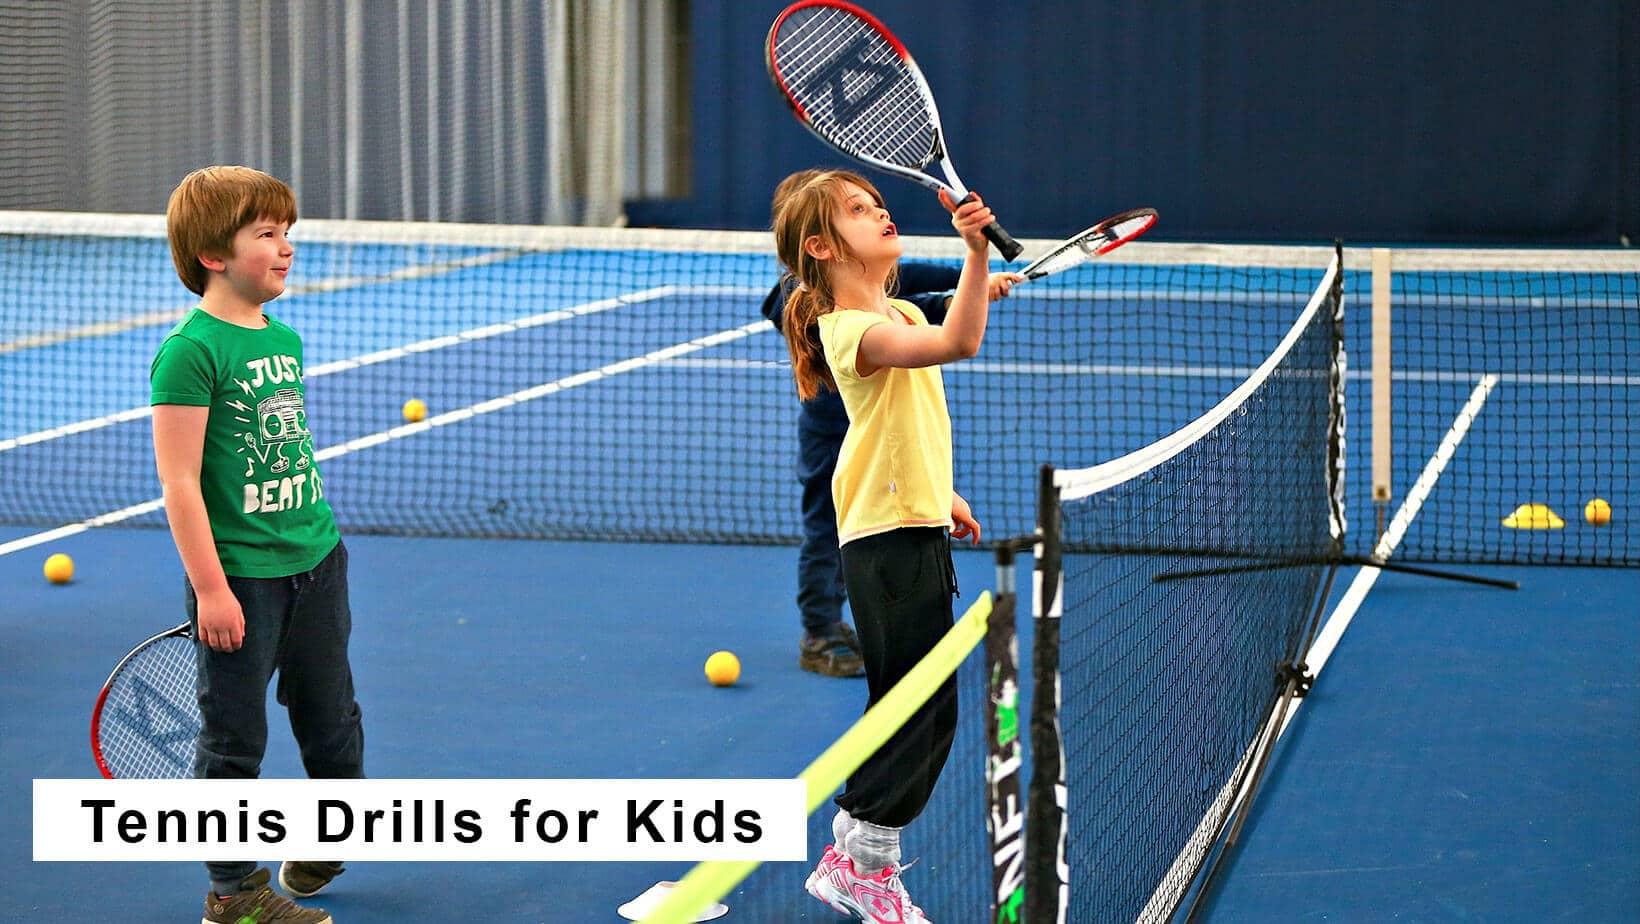 tennis drills for kids